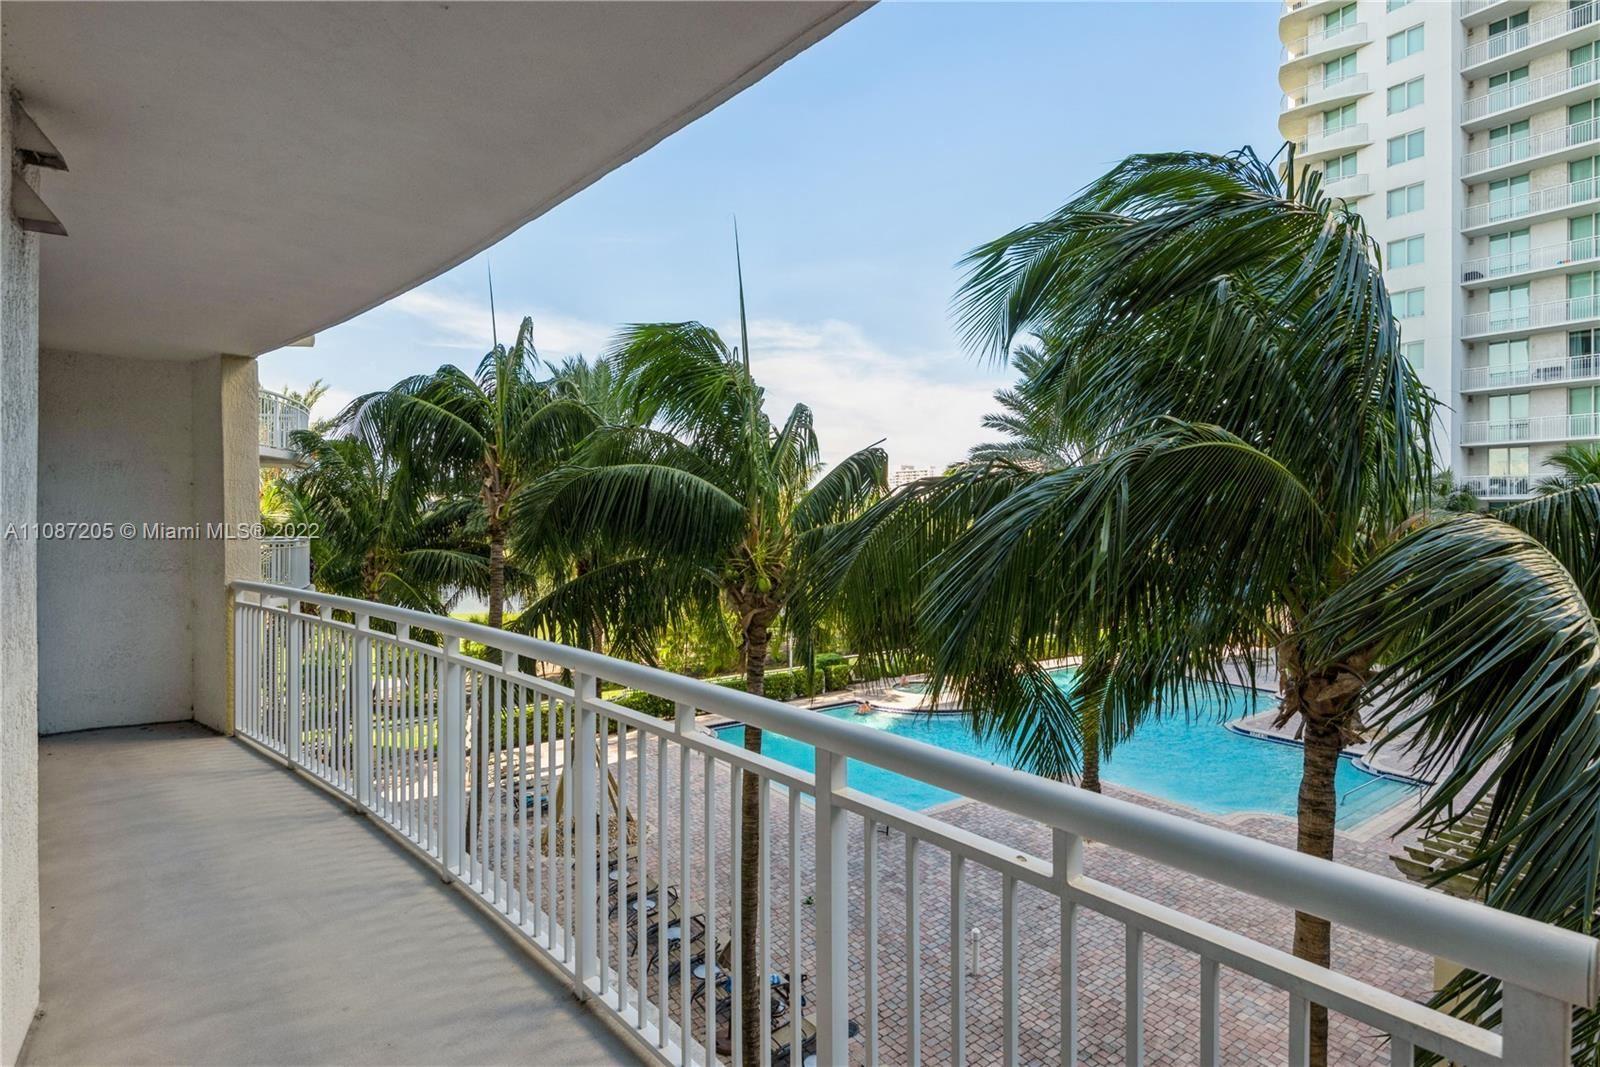 1745 E Hallandale Beach Blvd #204W, Hallandale Beach, FL 33009 - #: A11087205